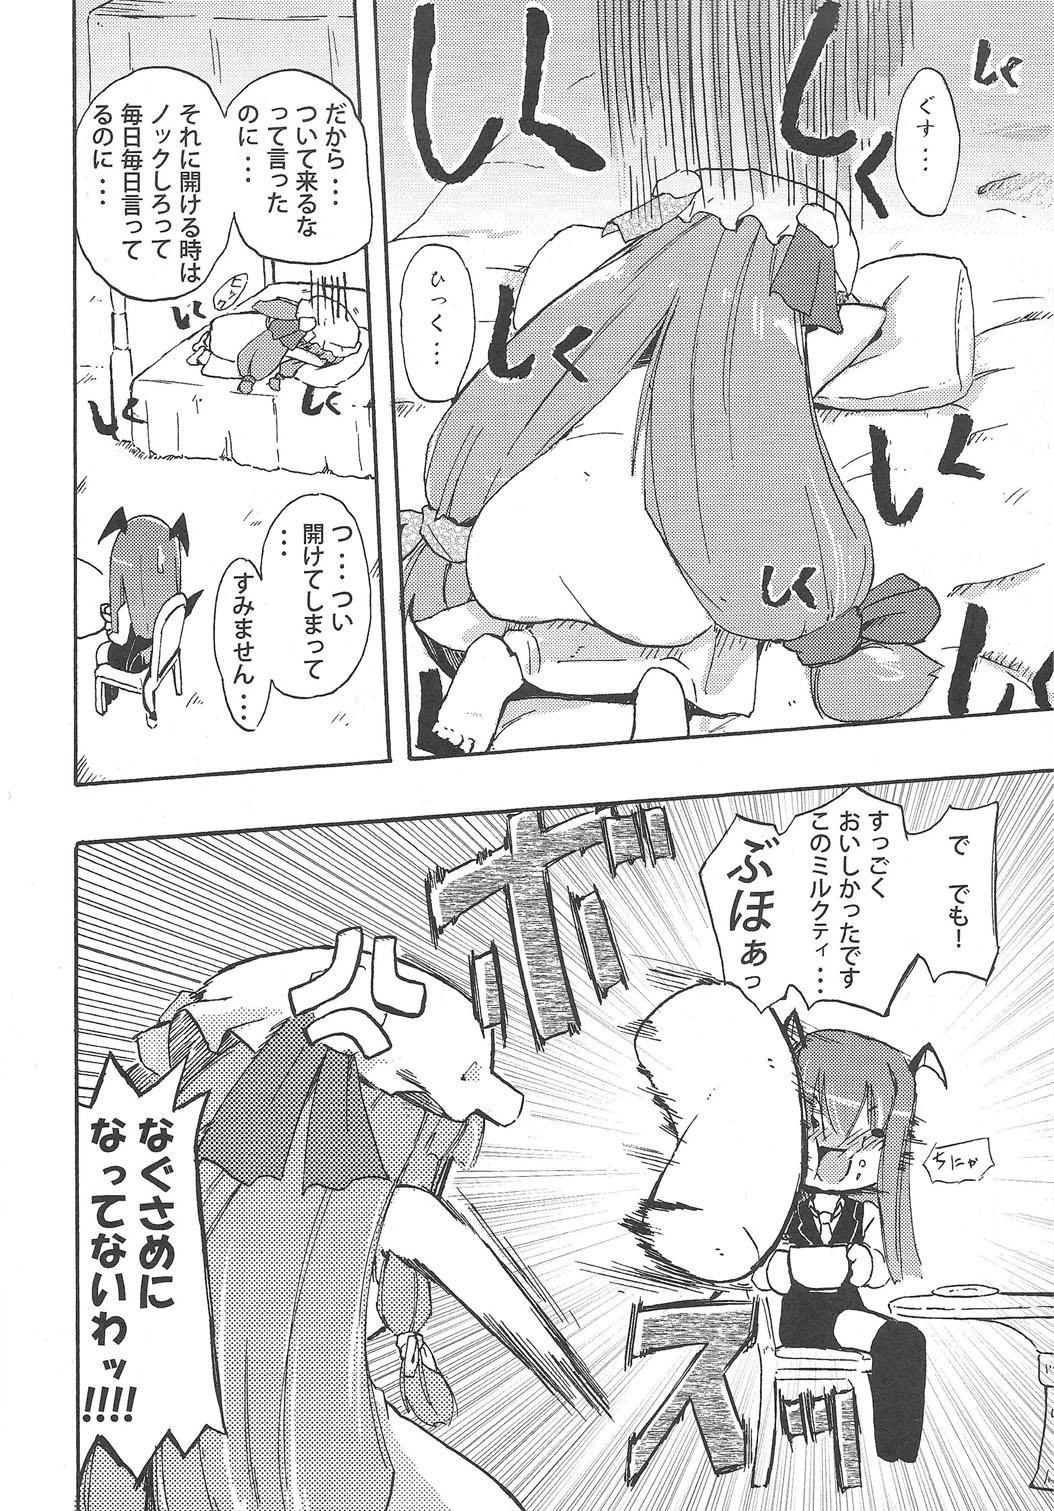 Homuraya Milk ★ Collection 14